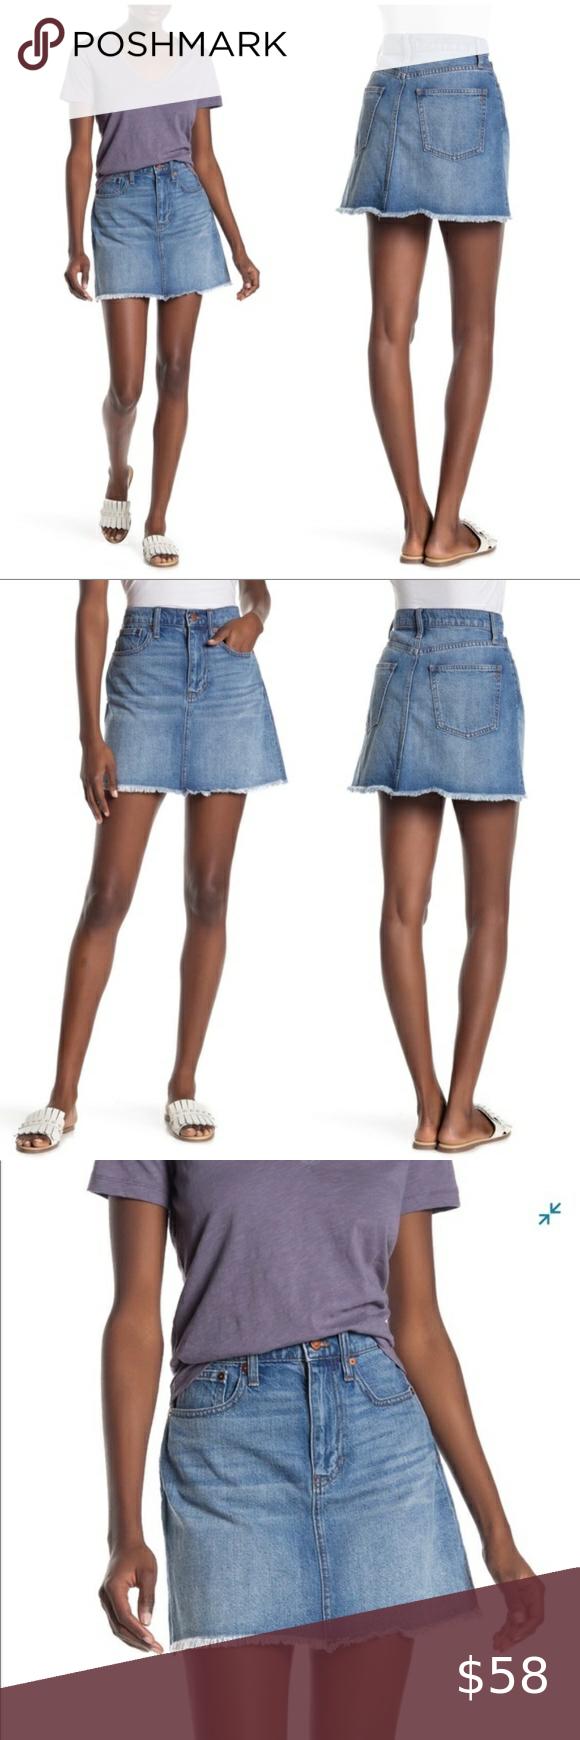 Mini skirts size 33 Madewell Mccarren Denim Mini Skirt Size 33 Mini Skirts Denim Mini Skirt Skirts